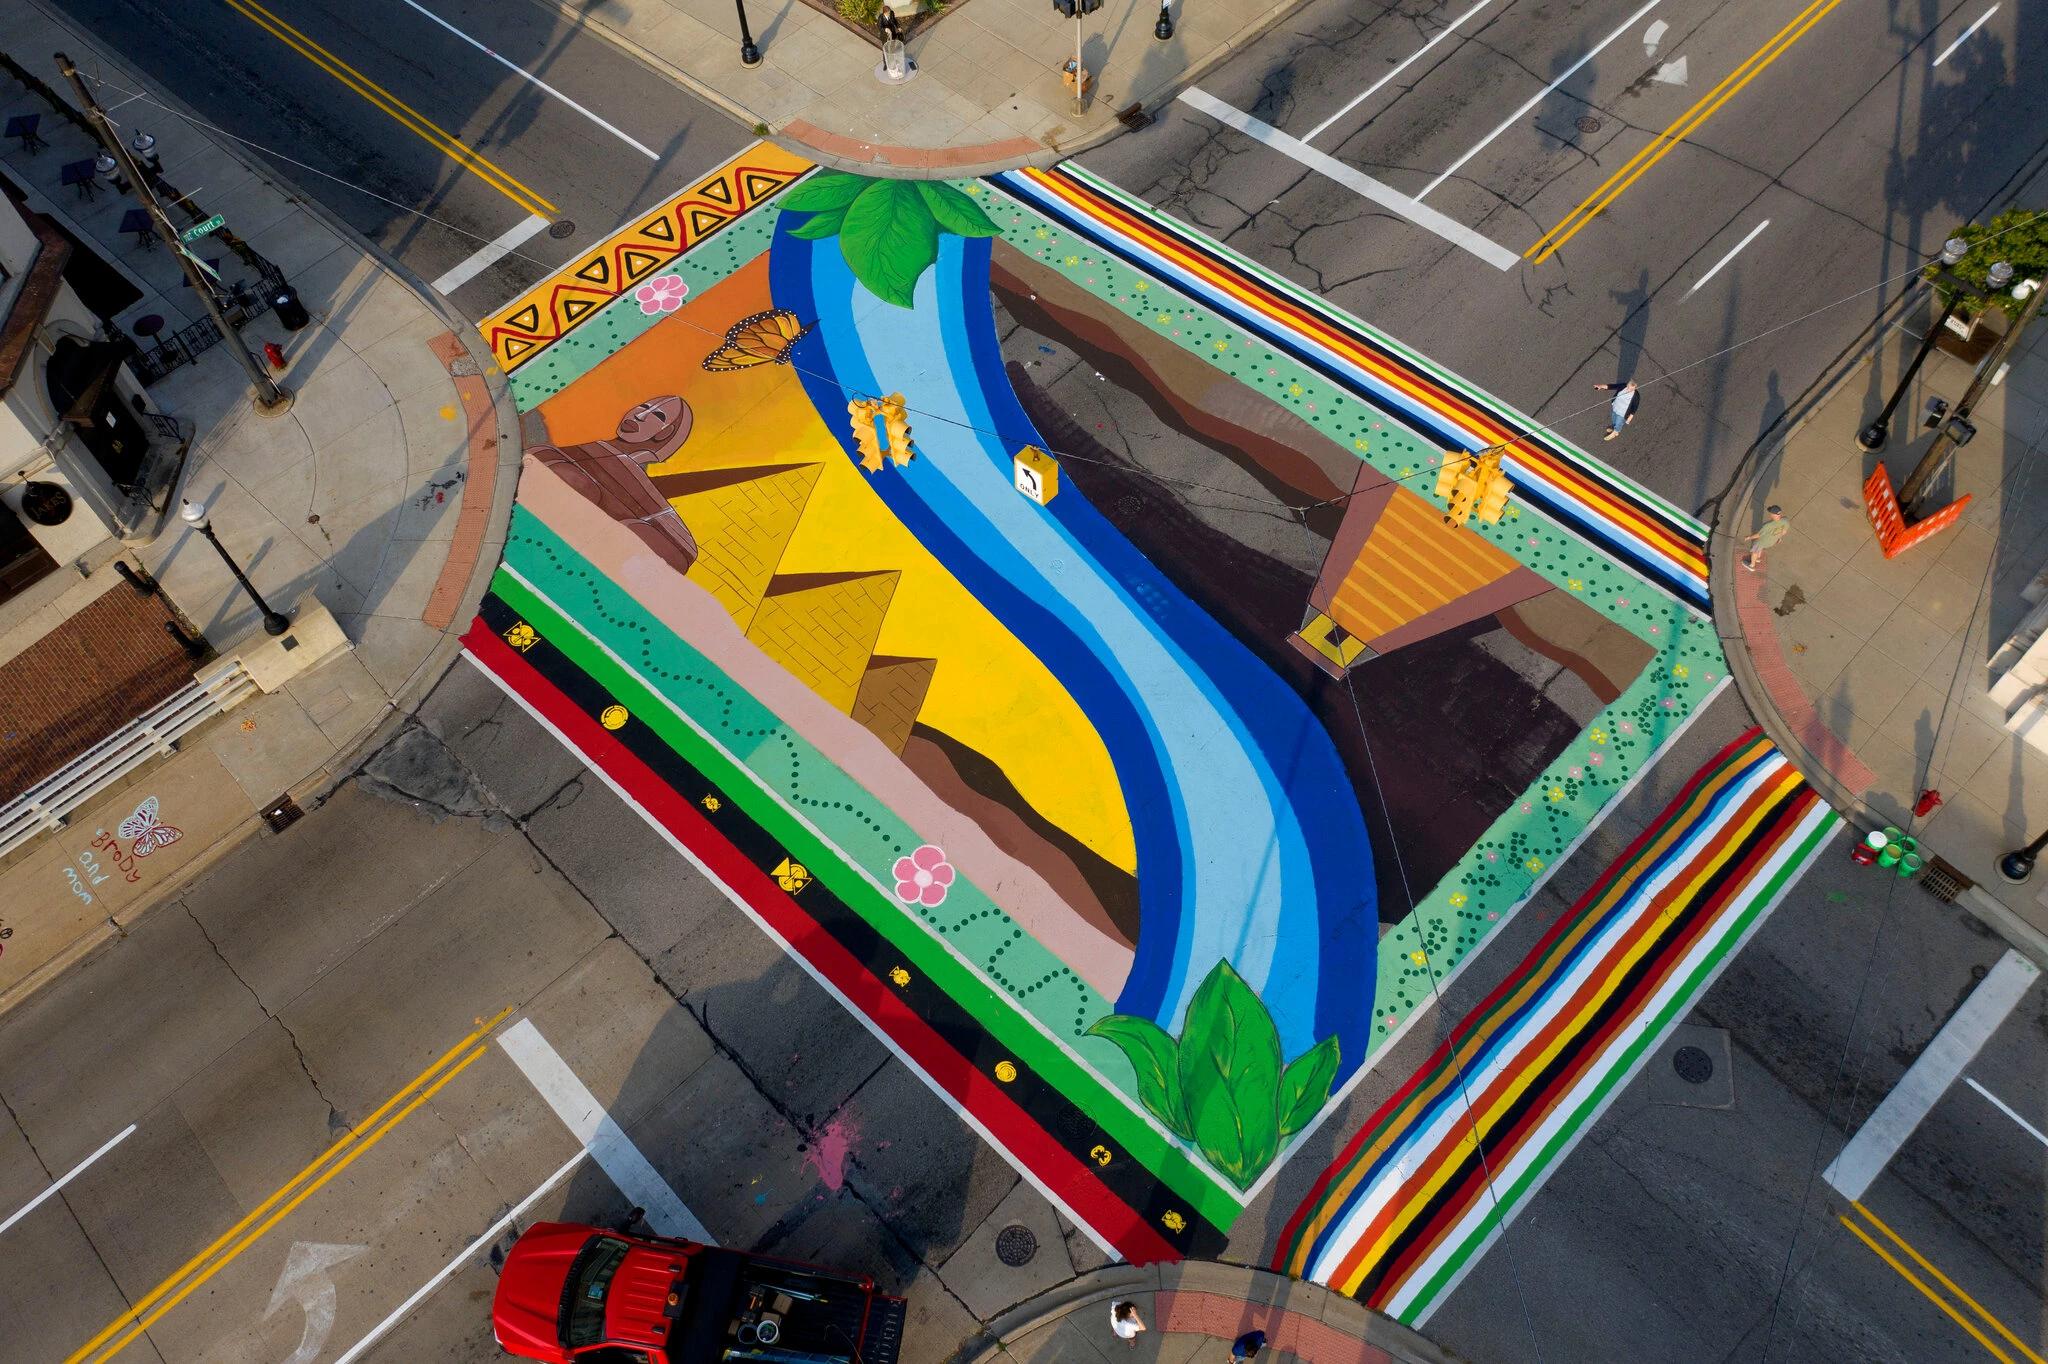 Retrieved from https://www.nytimes.com/2021/05/20/arts/murals-asphalt-streets.html